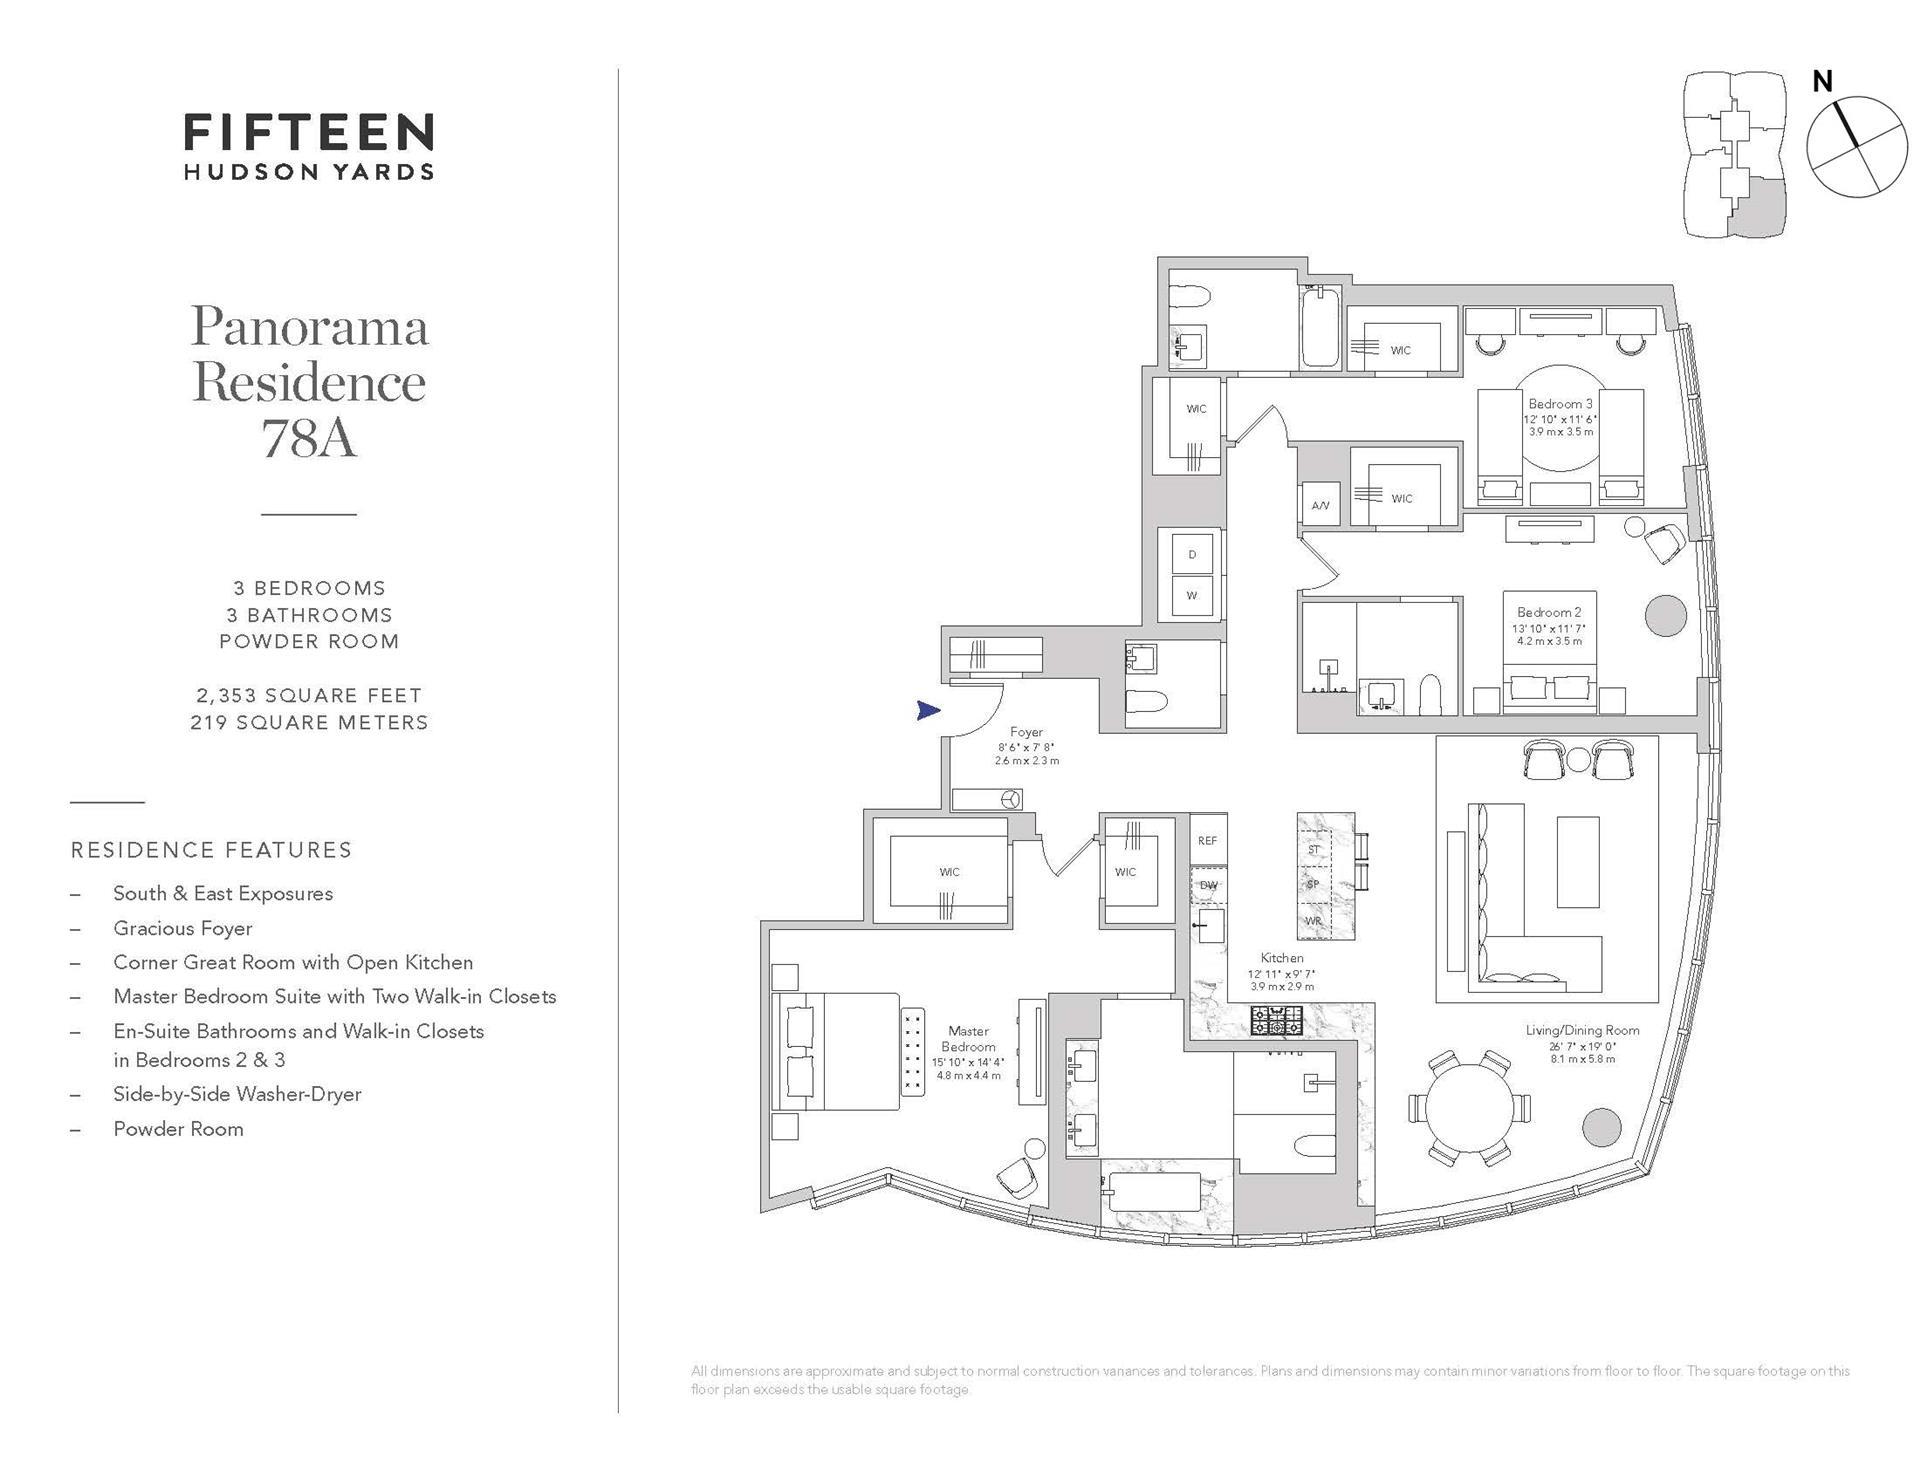 Floor plan of 15 Hudson Yards, 78A - Chelsea, New York